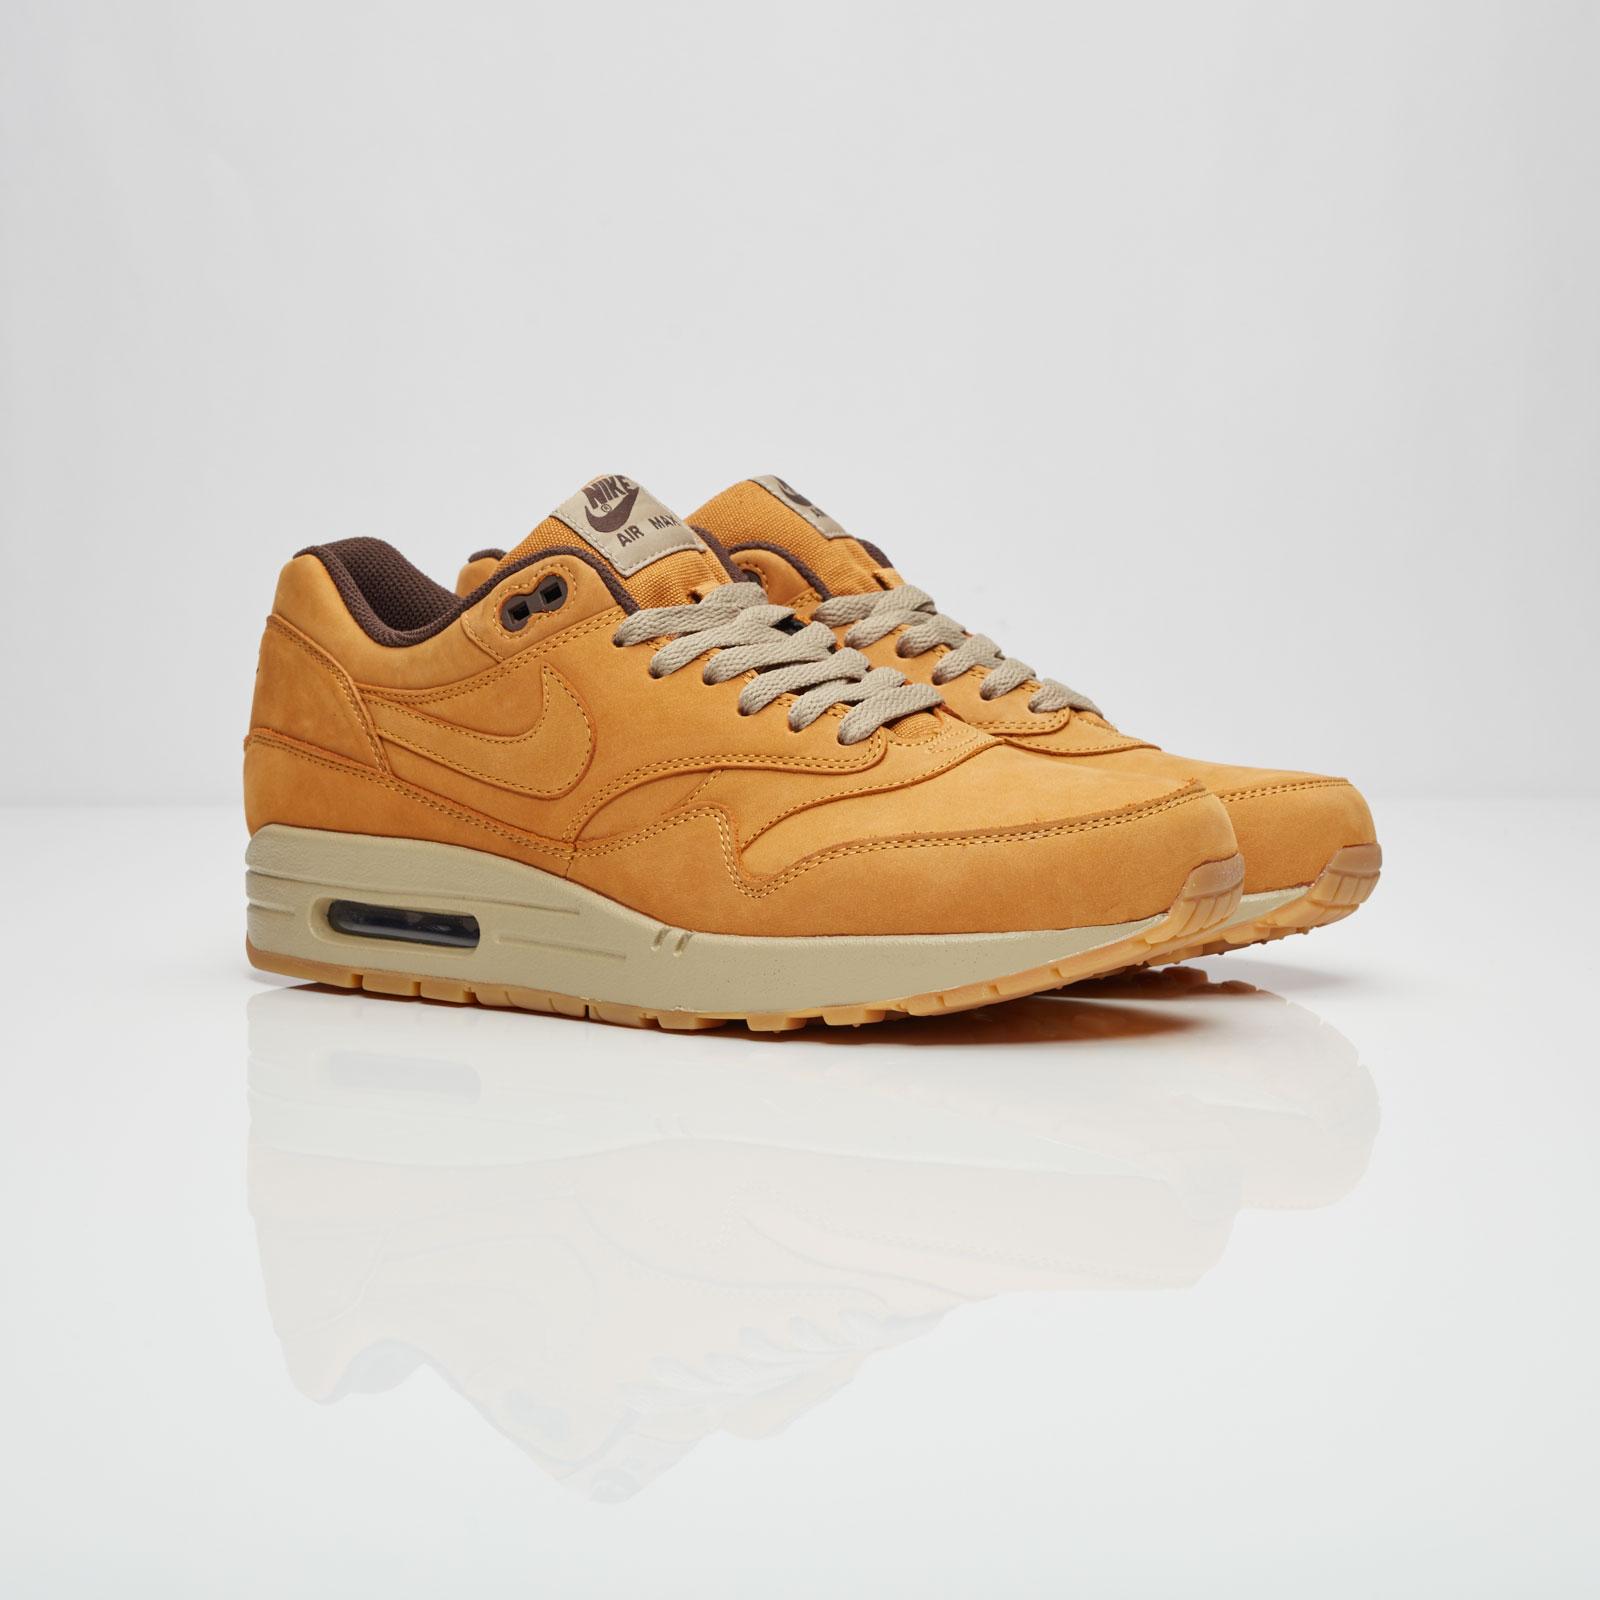 release date 6fe82 b1dd0 Nike Air Max 1 Leather Premium